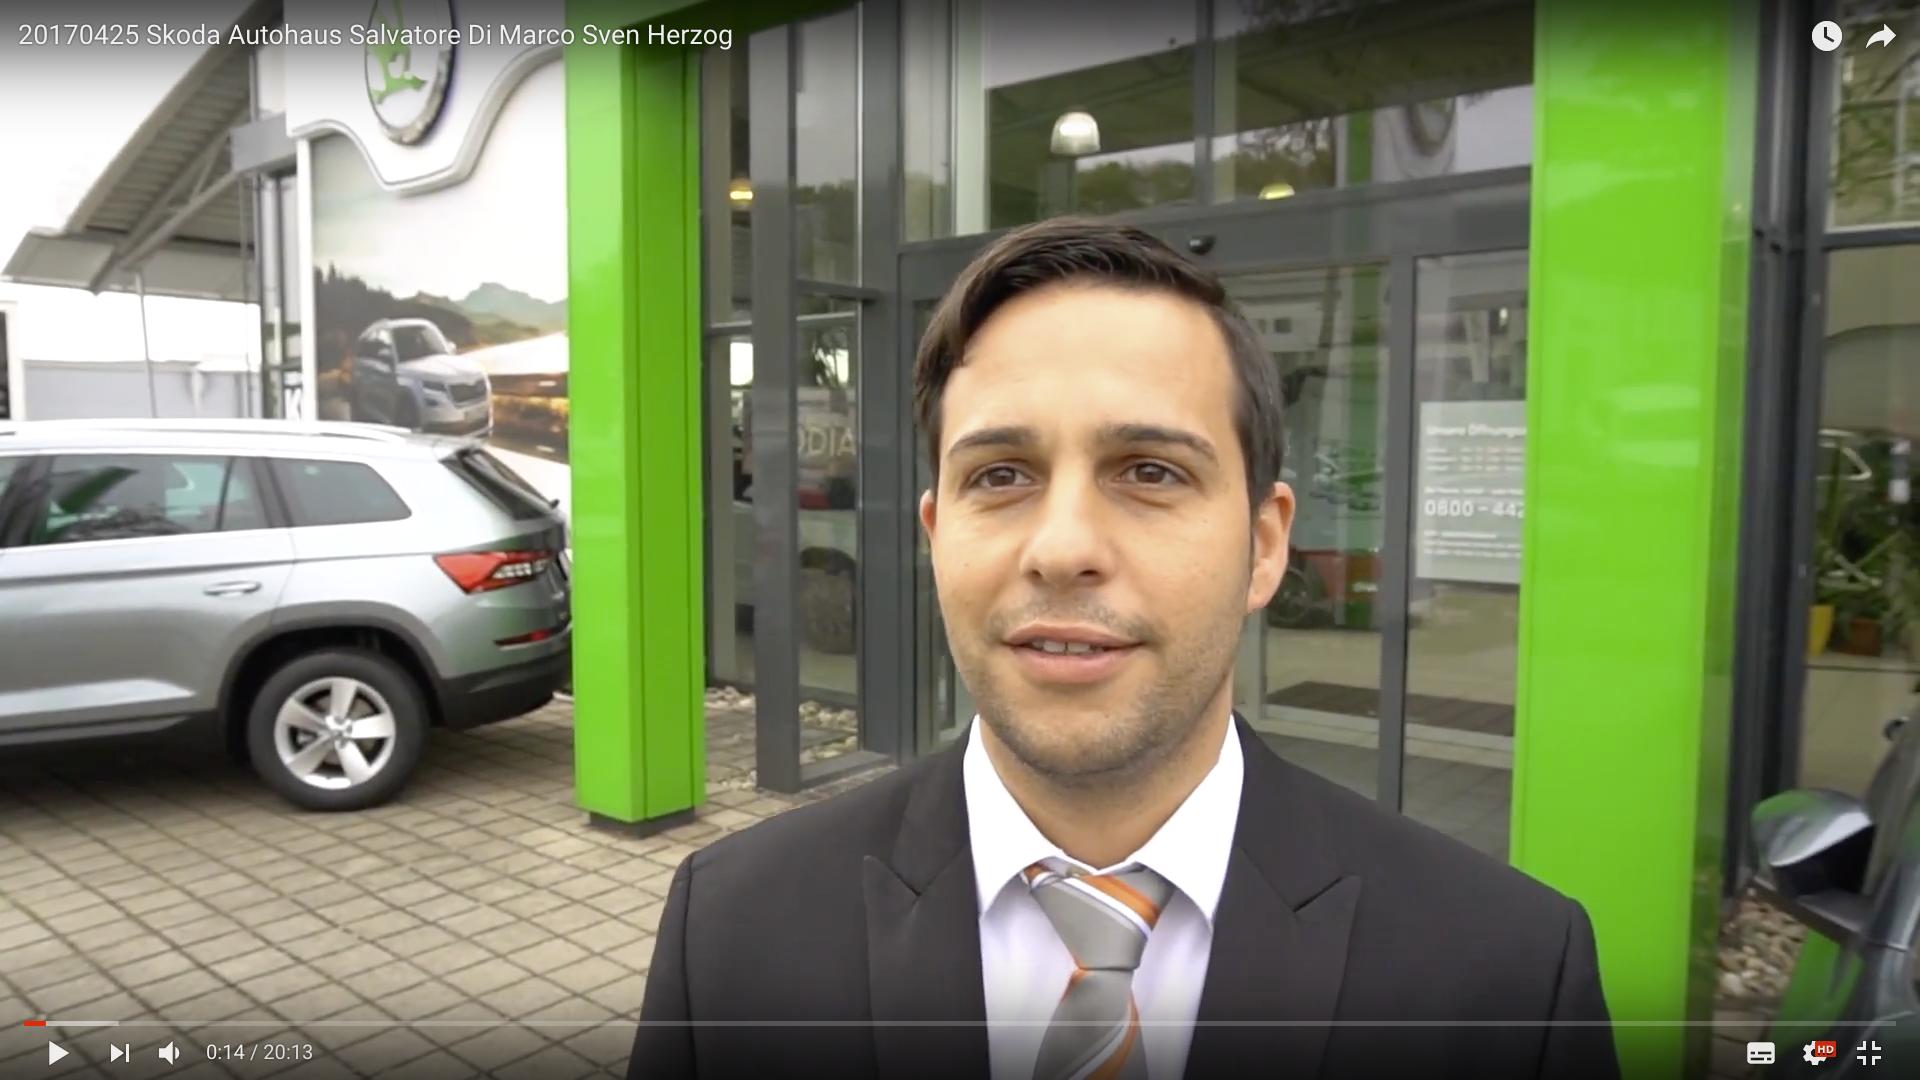 2017 Rittersbacher Skoda Zentrum Saarbrücken Verkaufsleiter Salvatore Di Marco _MSM_MEDIEN_SAAR_MOSEL_SAARLAND_FERNSEHEN_1_ED_SAAR